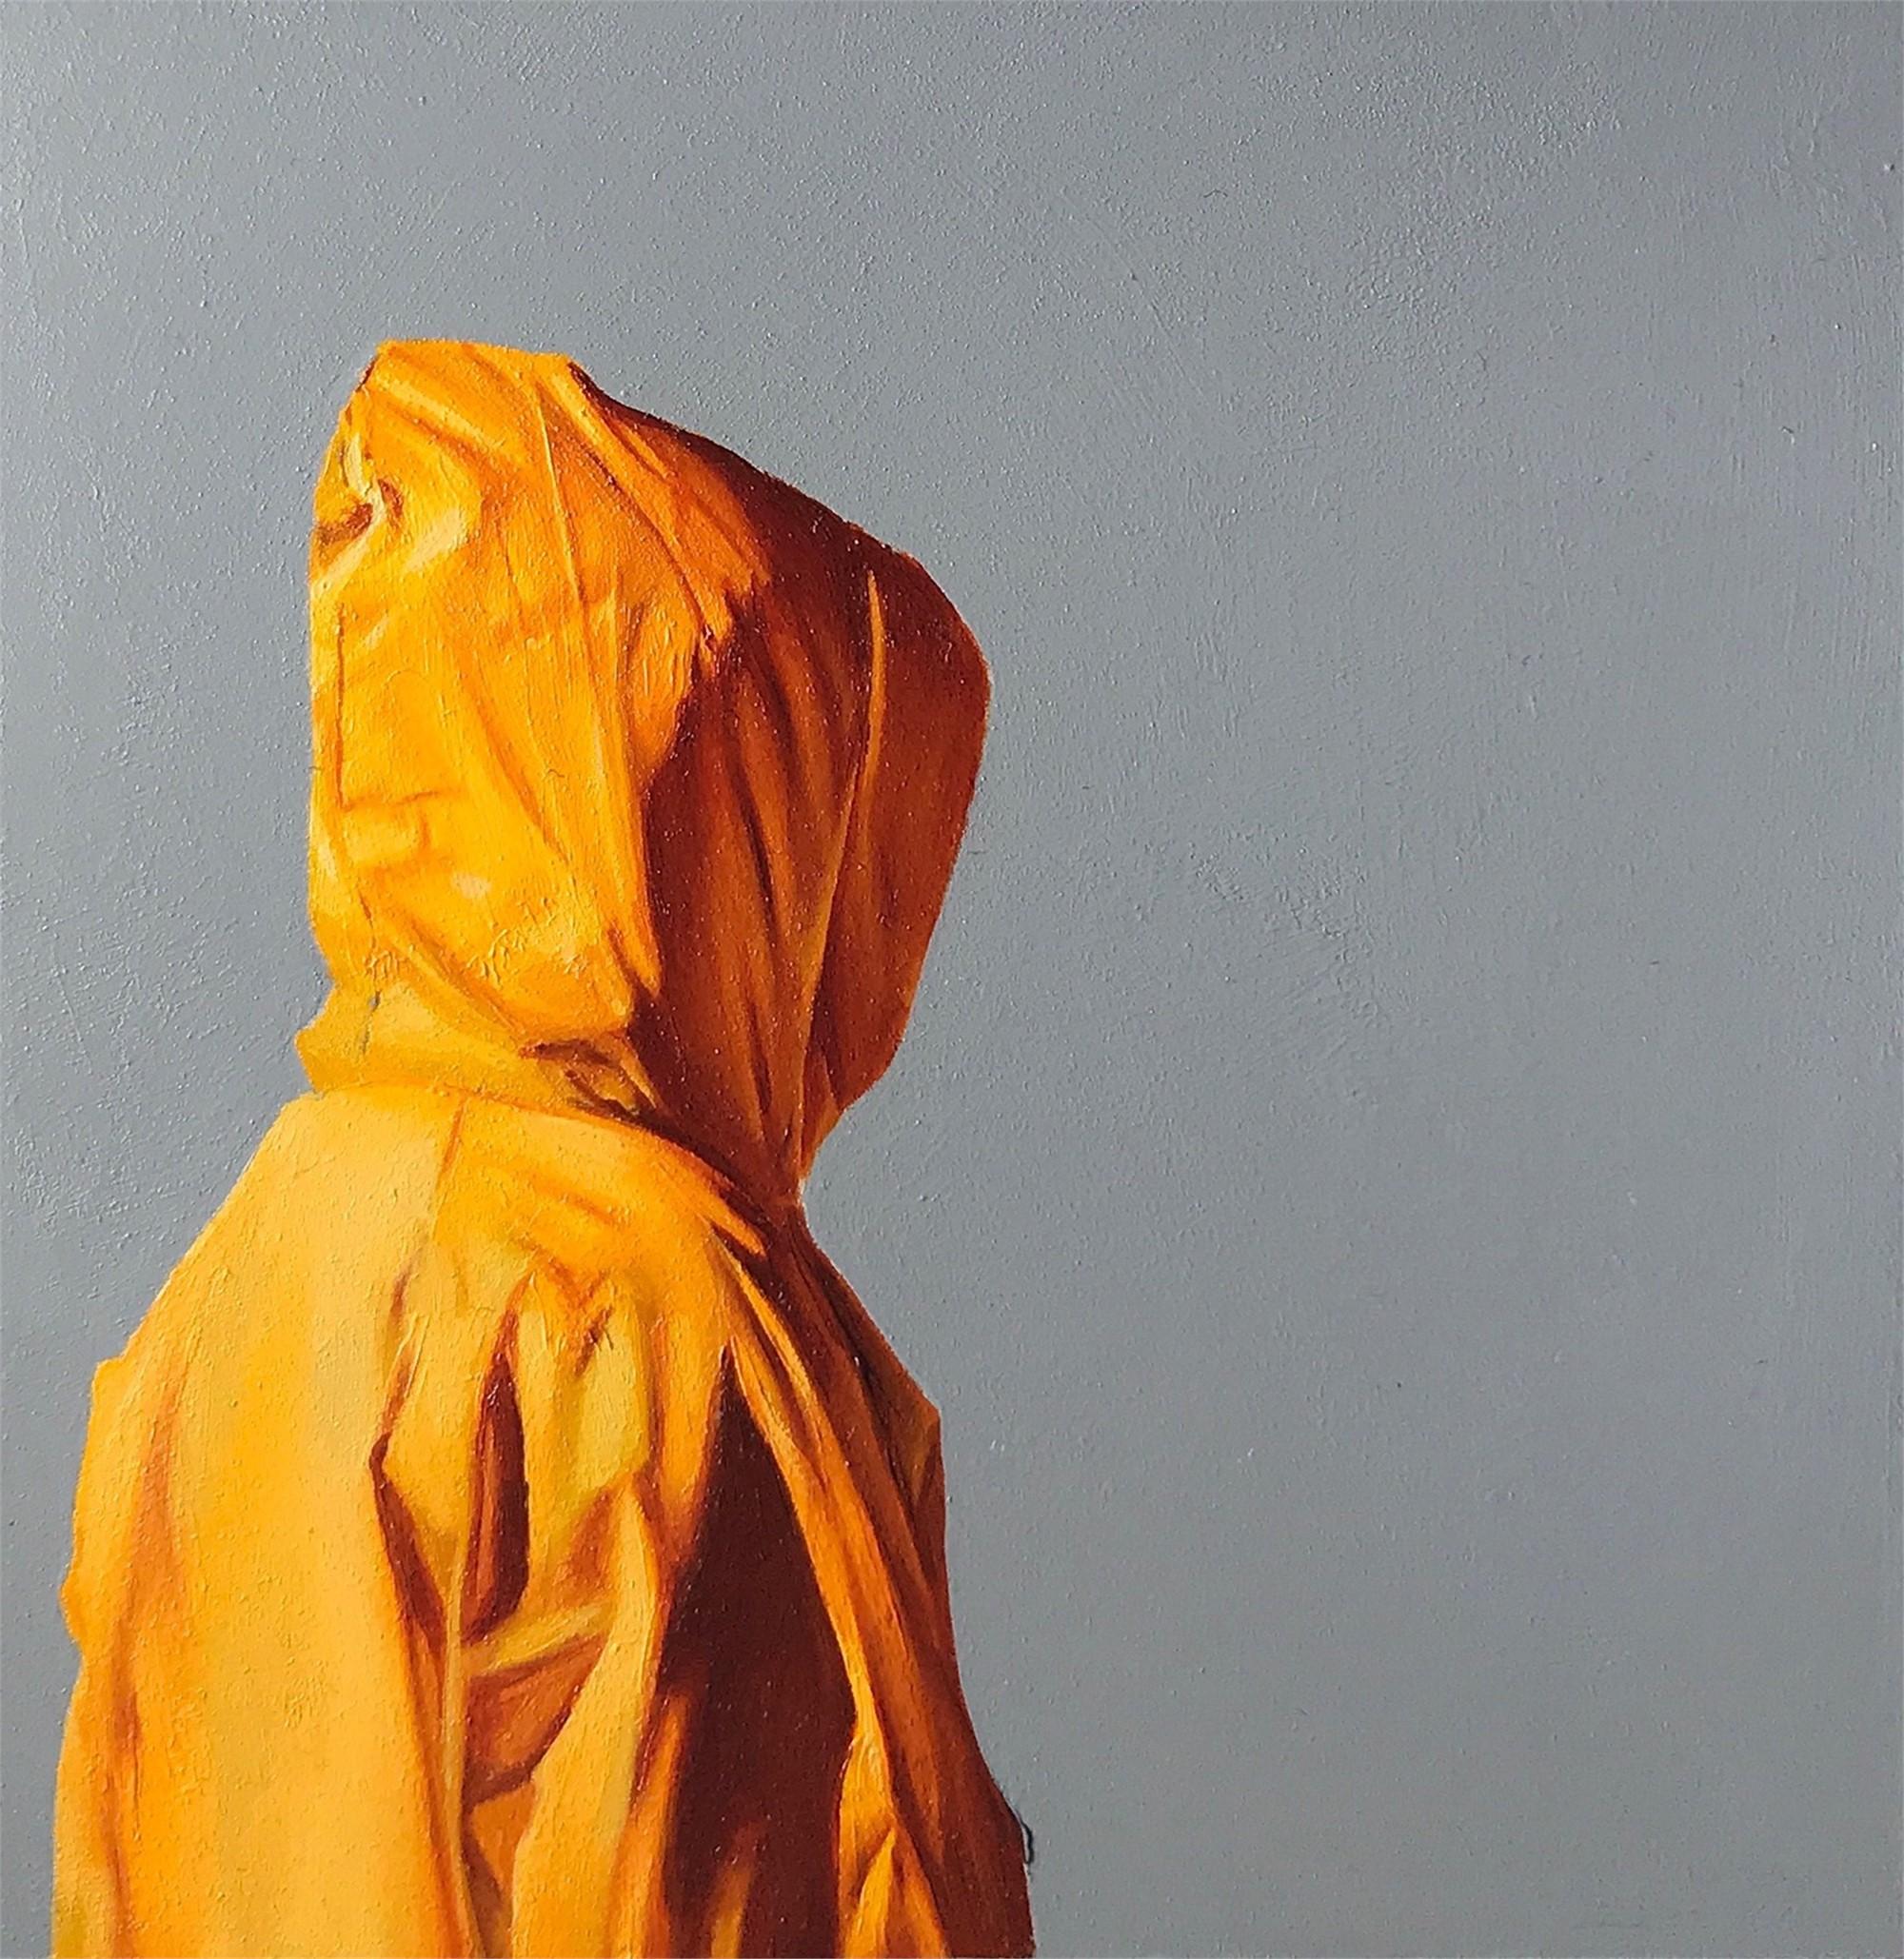 Yellow No. 1 by Joseph Martinez